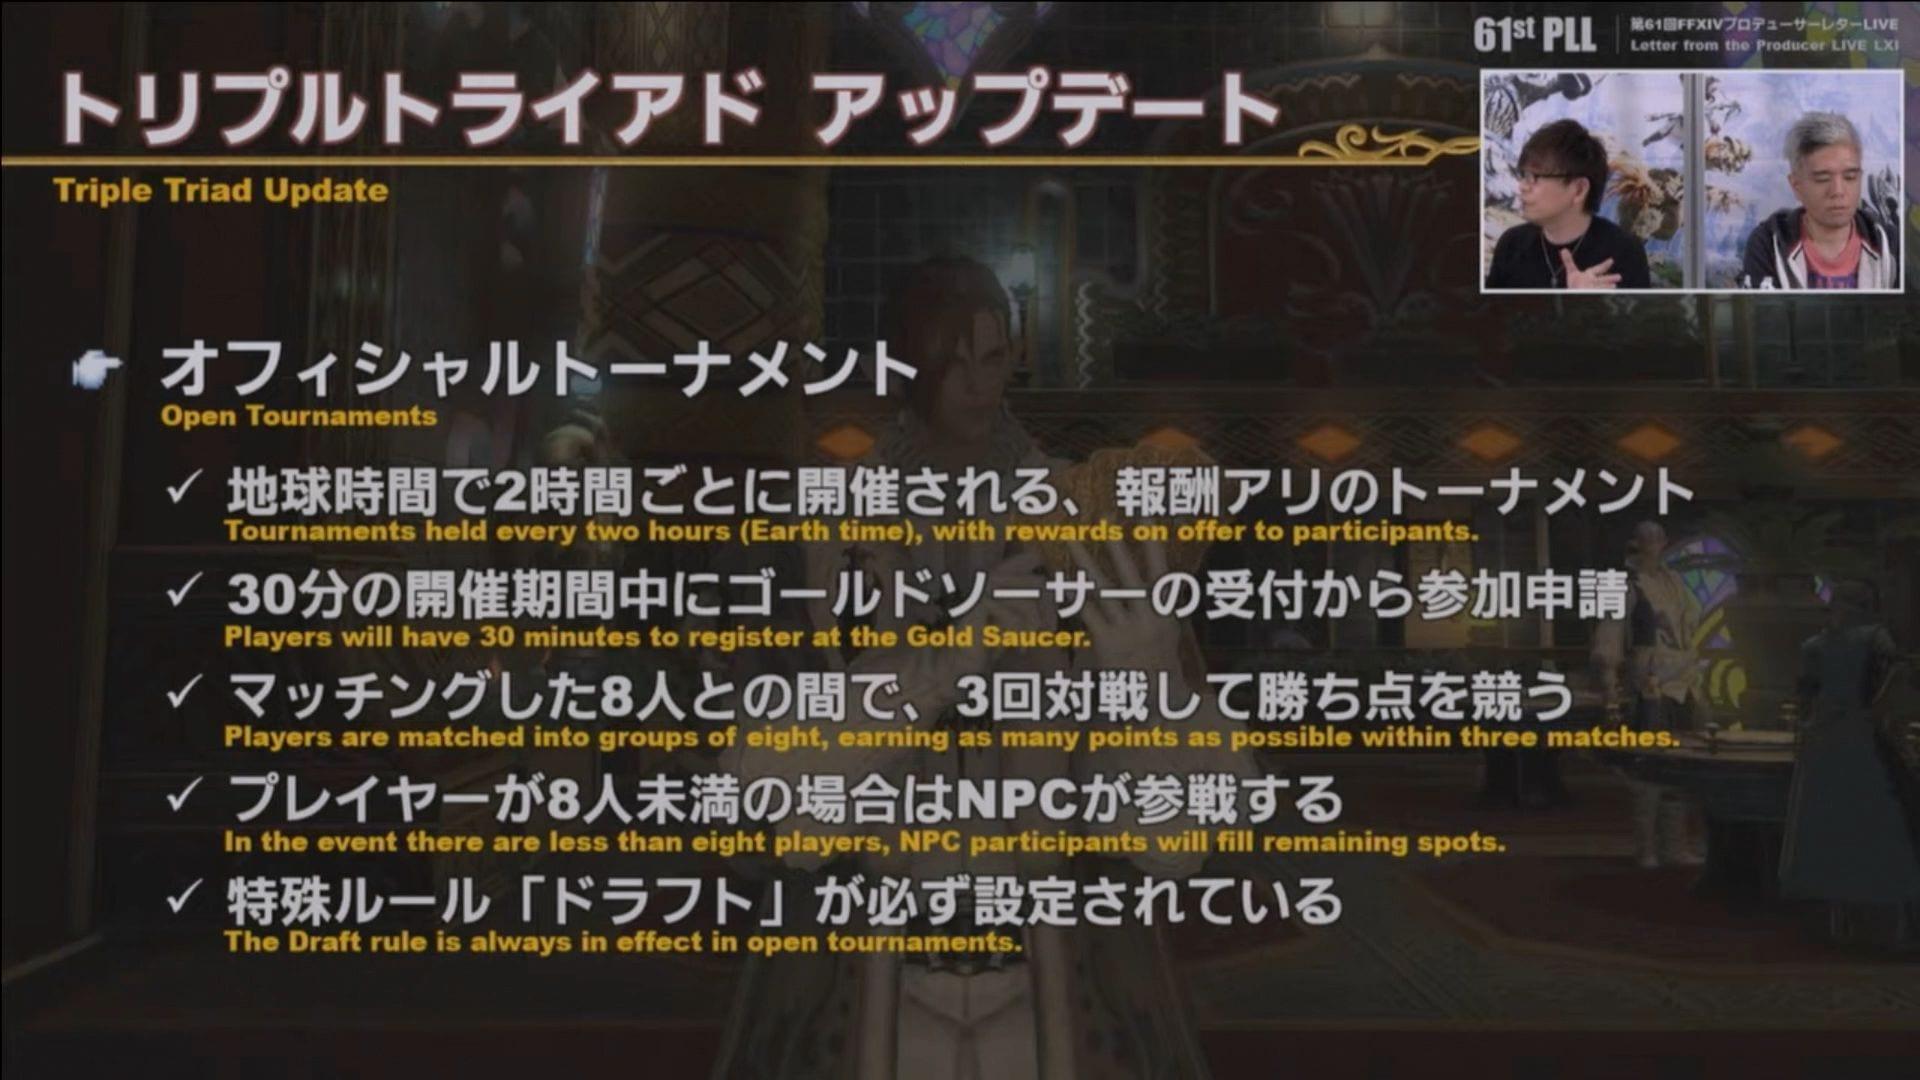 Final-Fantasy-XIV-Screenshot-2020-11-27-14-00-51.jpg?ssl=1